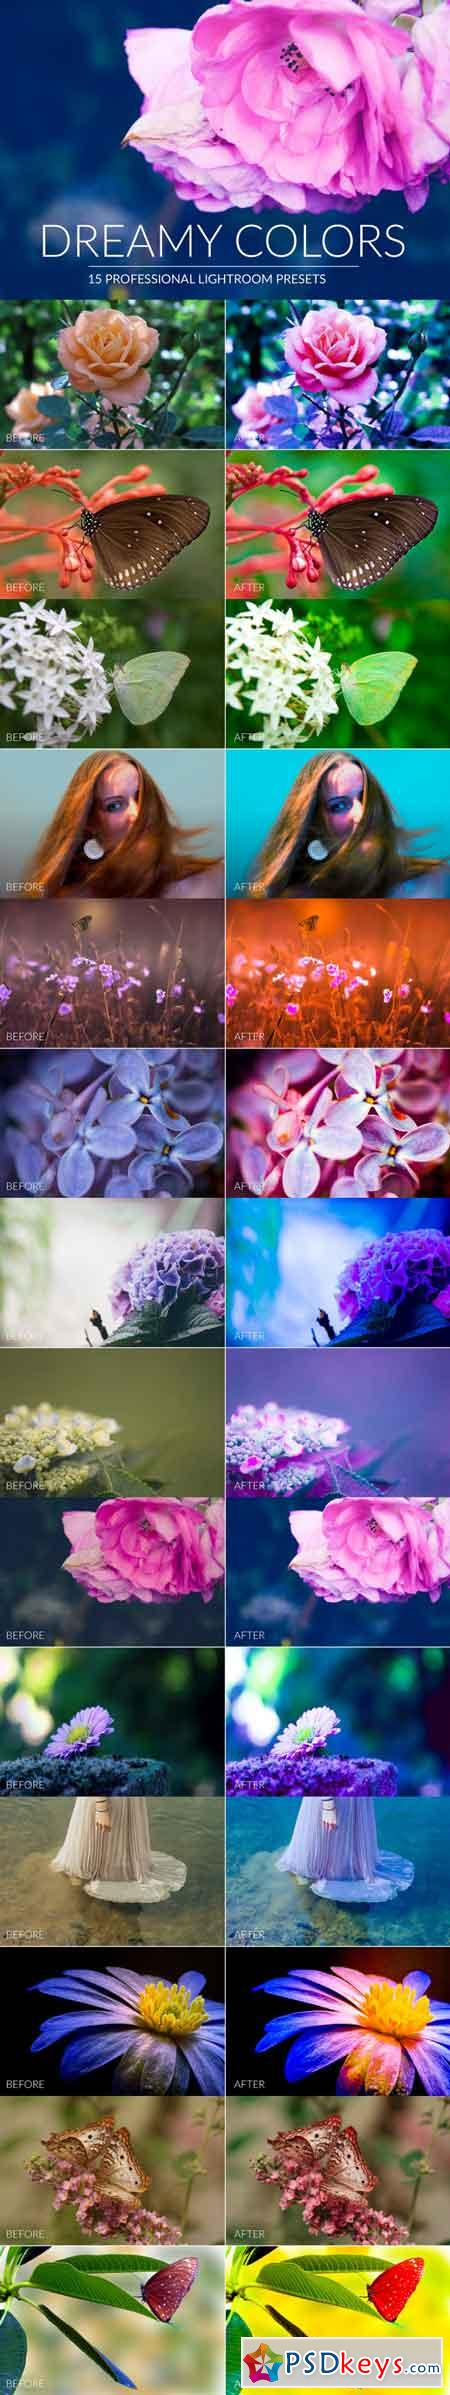 Dreamy Colors Lr Presets